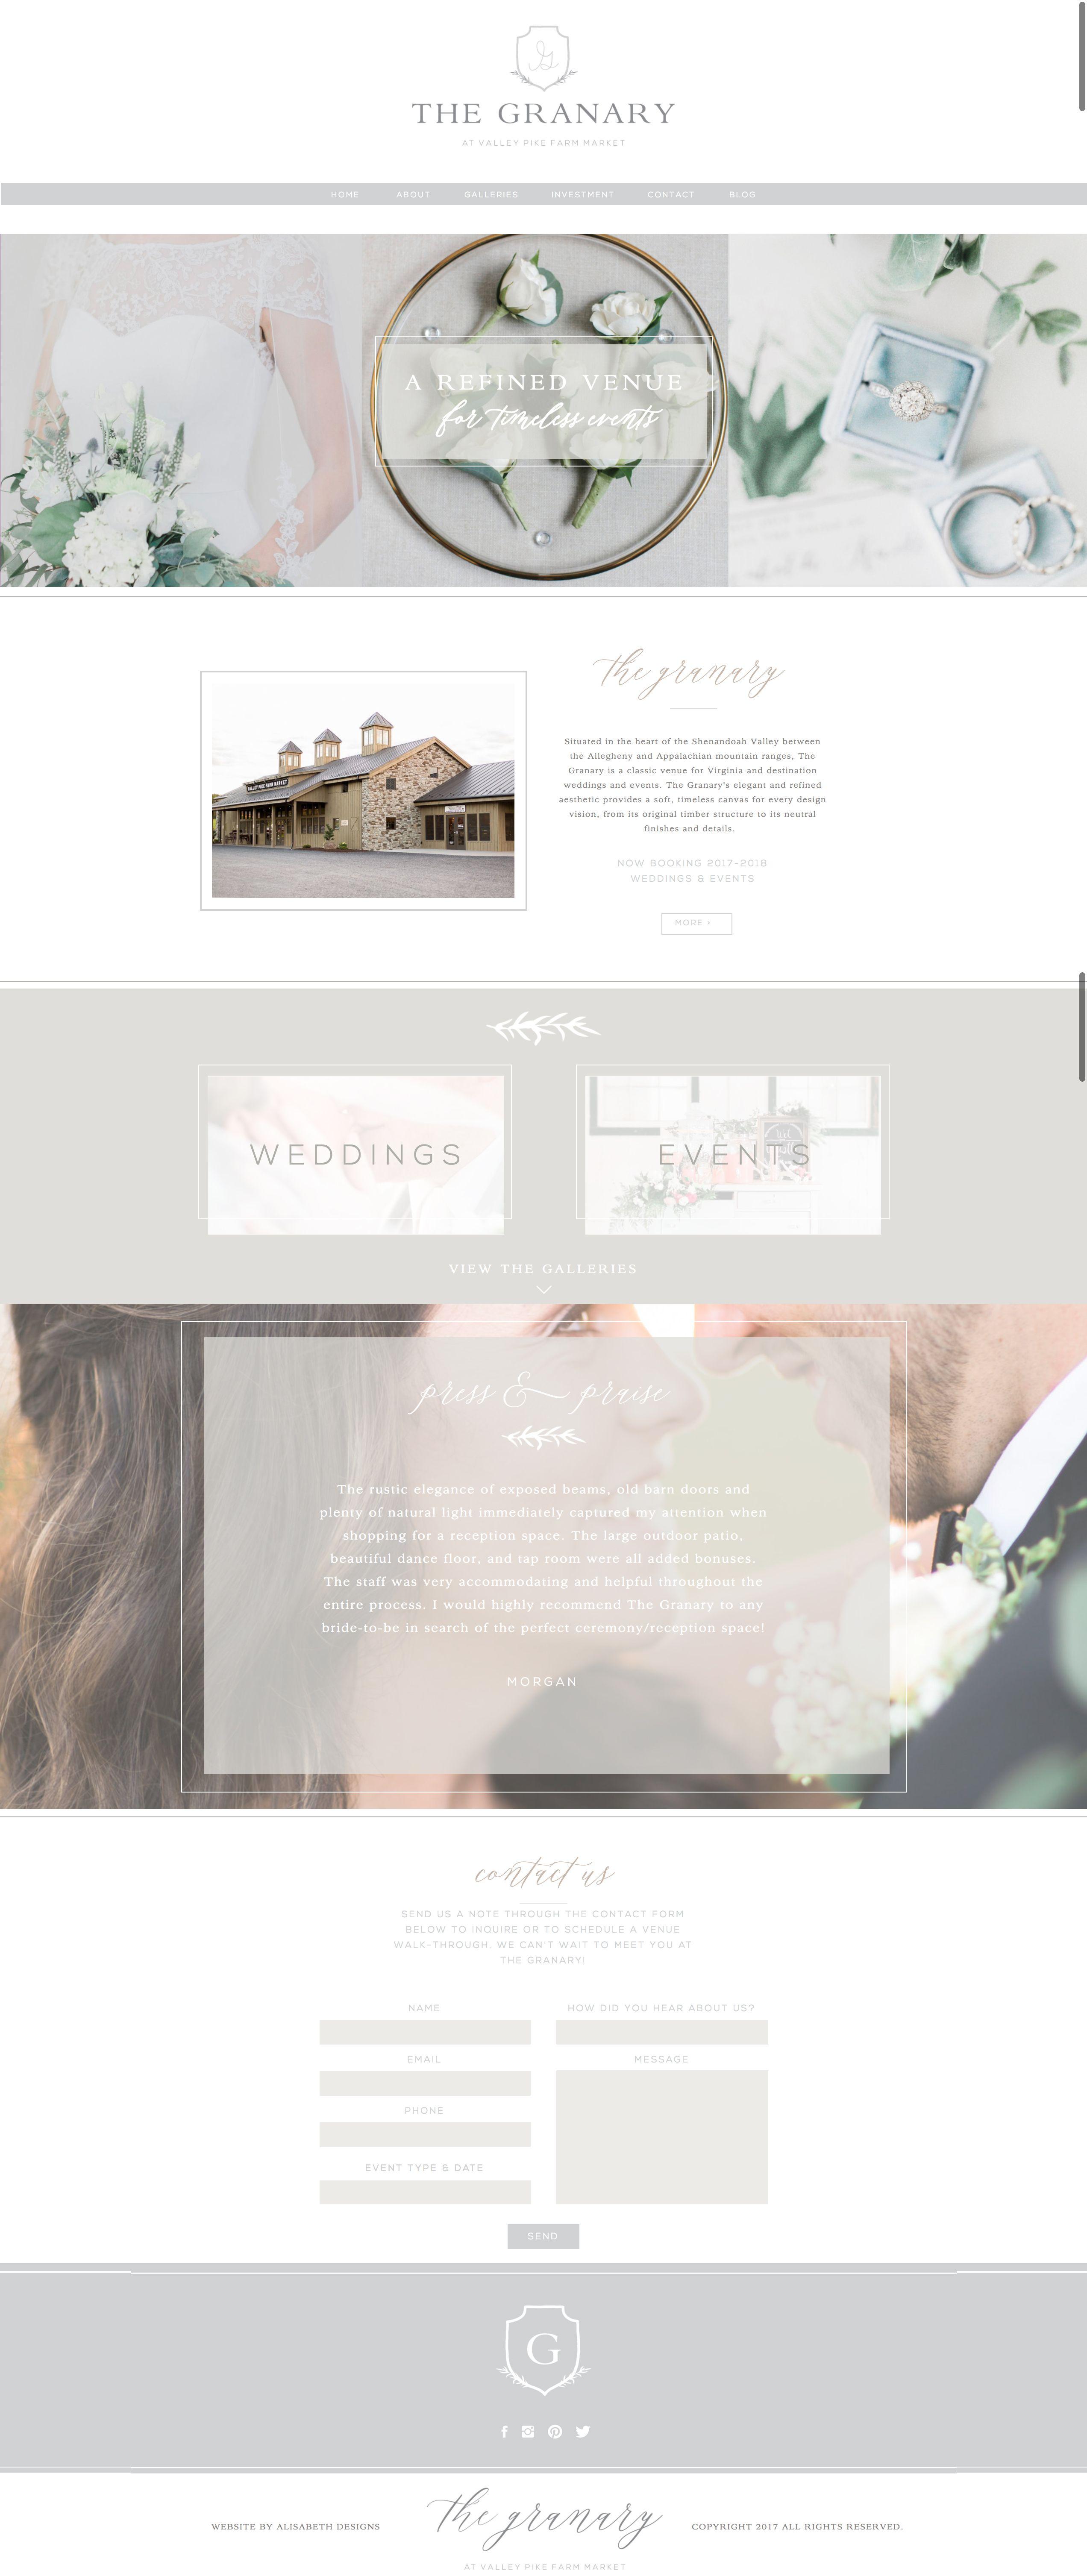 The Granary Website By Alisabeth Designs Wedding Venue Branding Ethereal Feminine Feminine Web Design Feminine Website Design Wedding Website Design